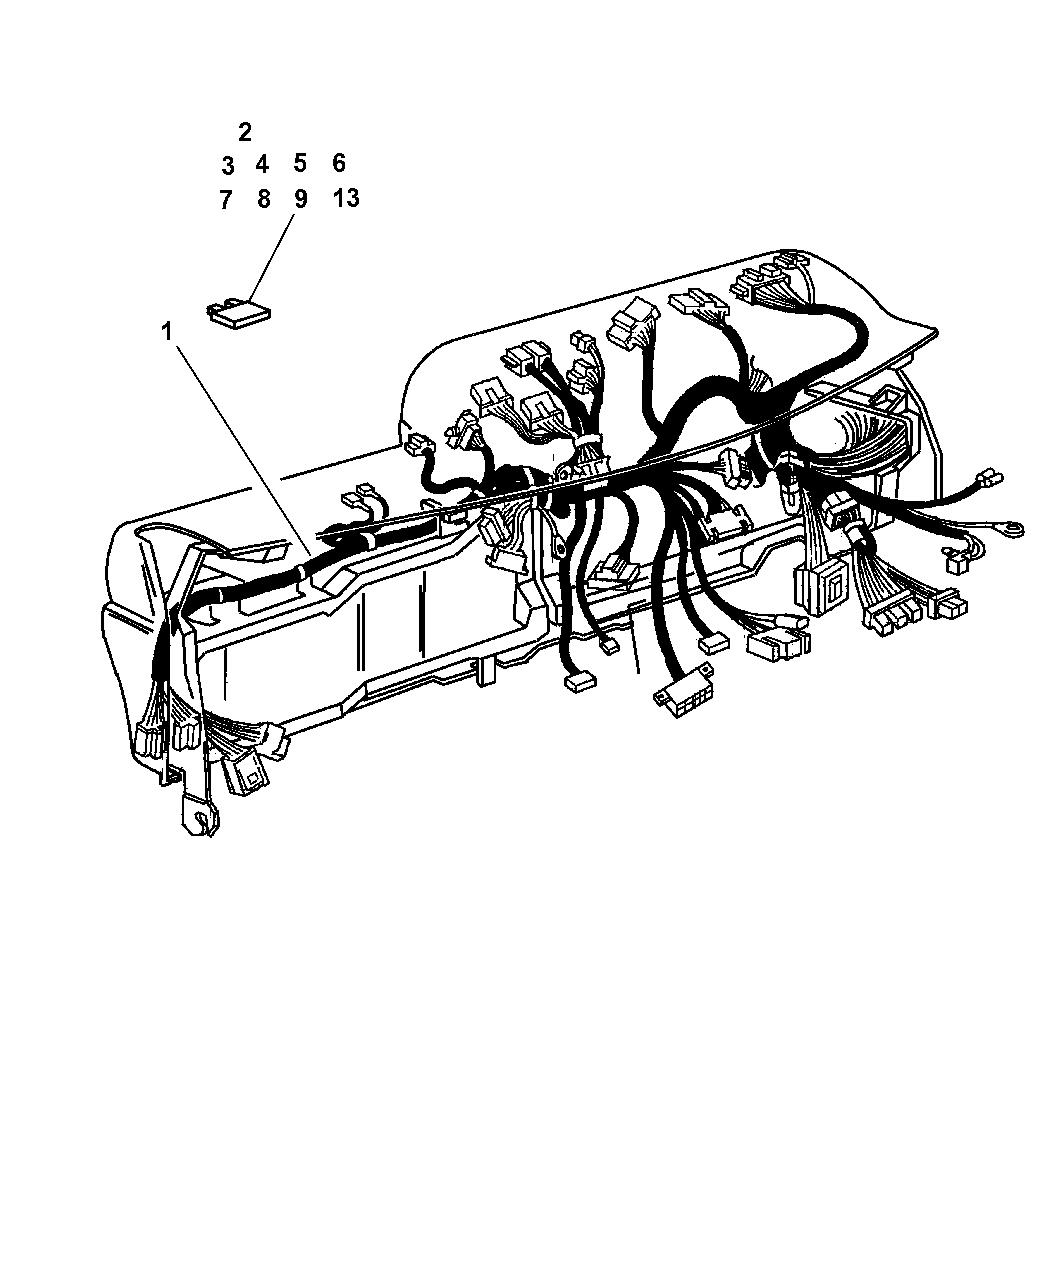 56045361ag